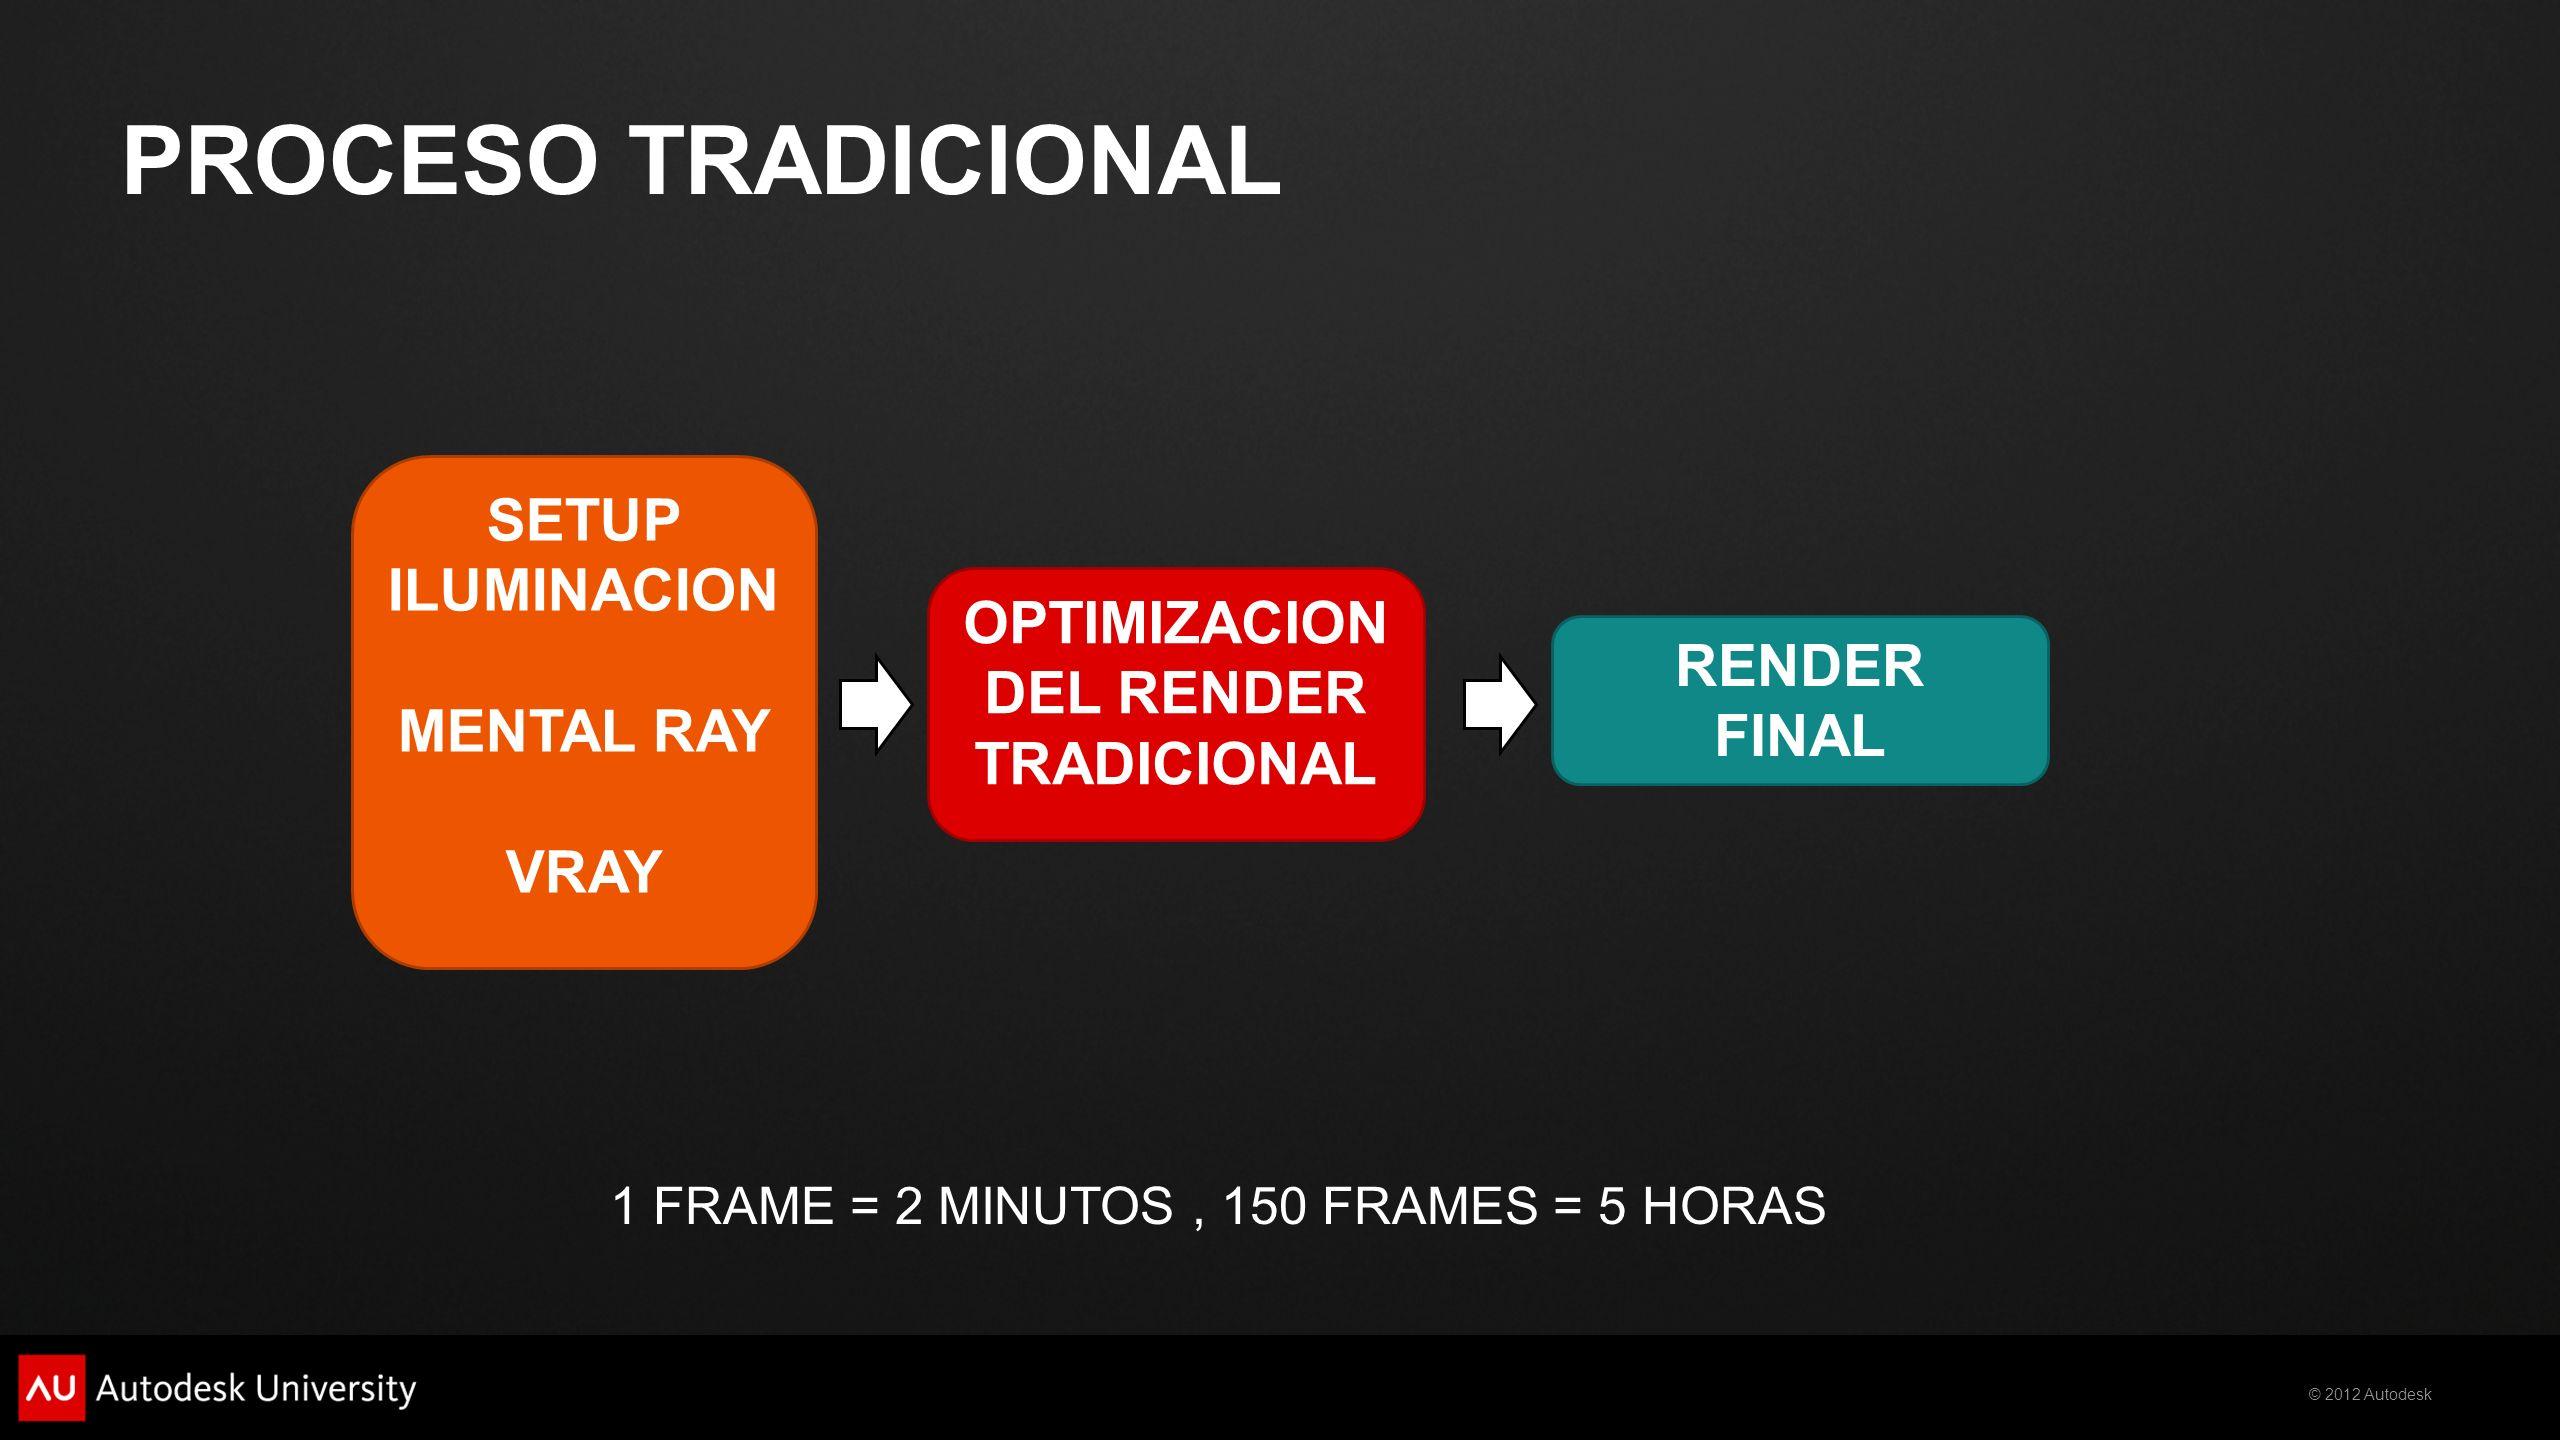 © 2012 Autodesk PROCESO TRADICIONAL SETUP ILUMINACION MENTAL RAY VRAY OPTIMIZACION DEL RENDER TRADICIONAL RENDER FINAL 1 FRAME = 2 MINUTOS, 150 FRAMES